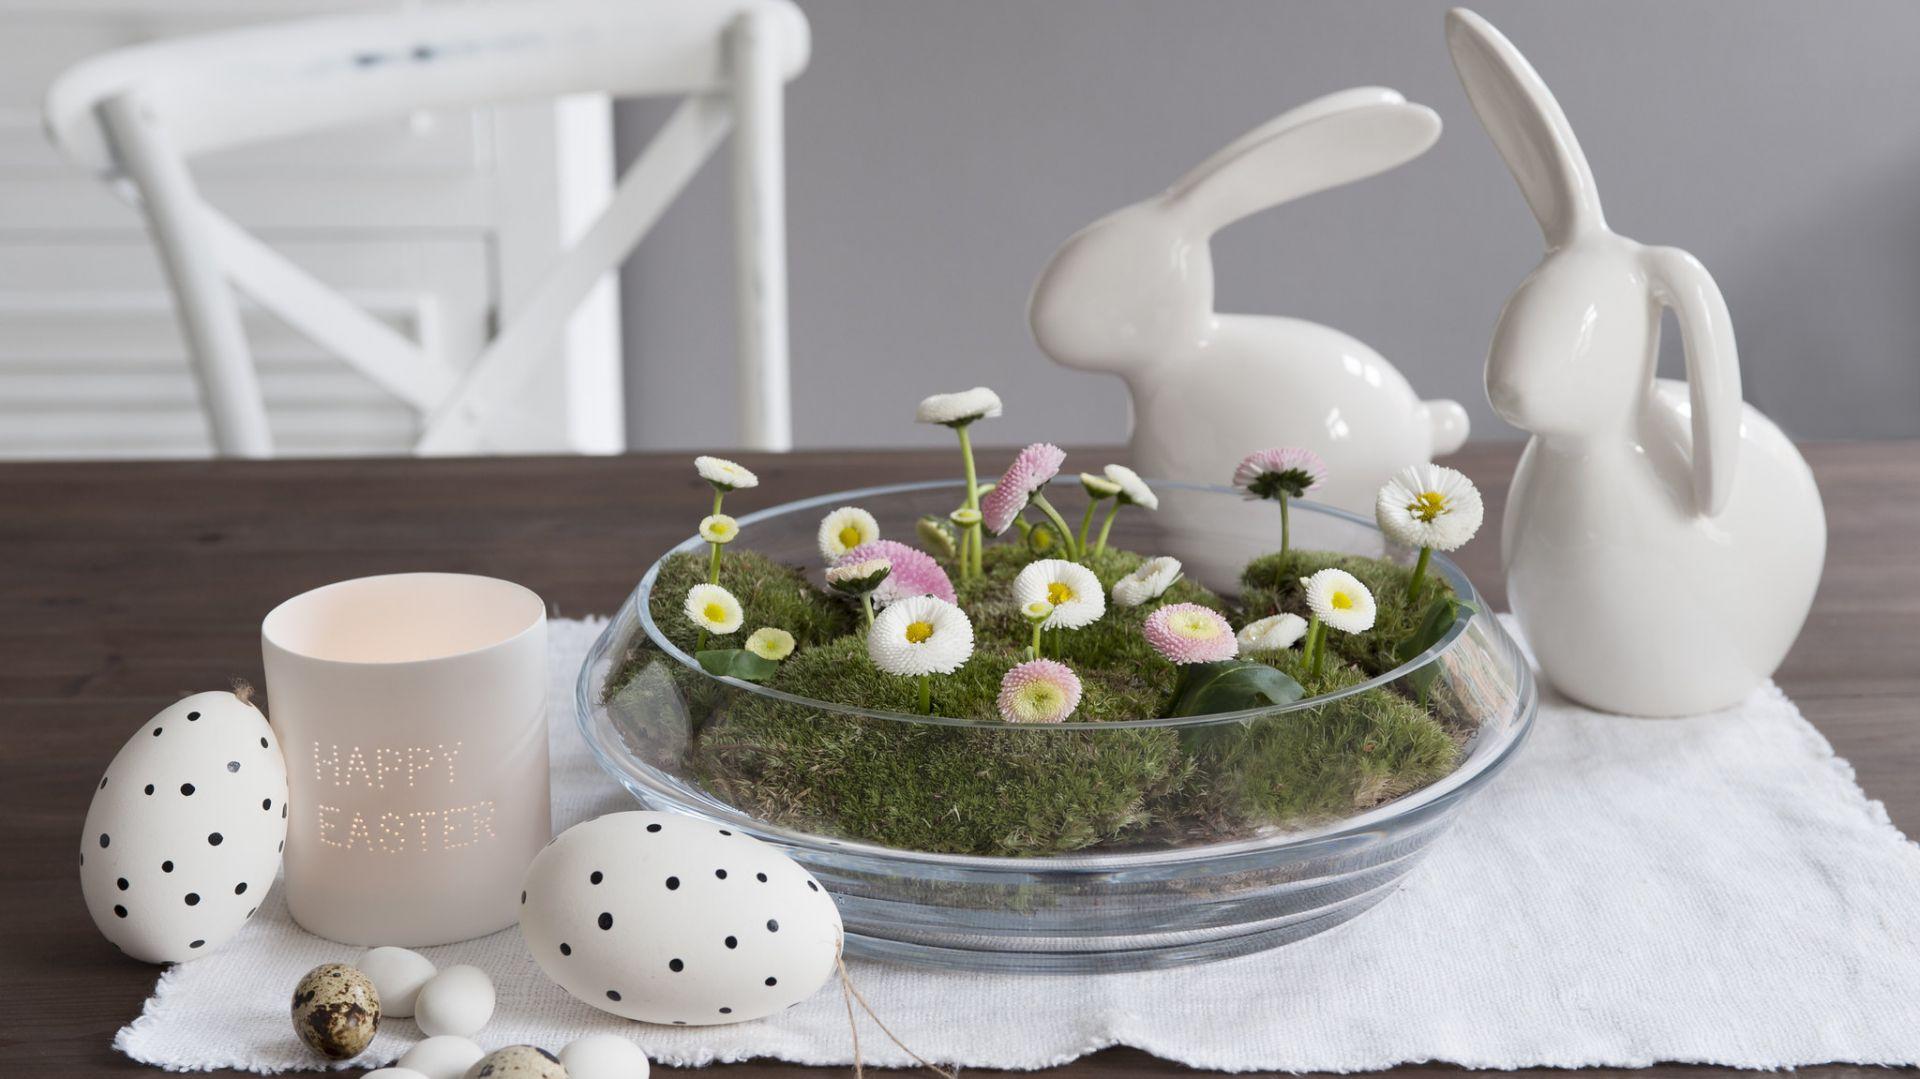 Wielkanocne dekoracje. Fot. Westwing